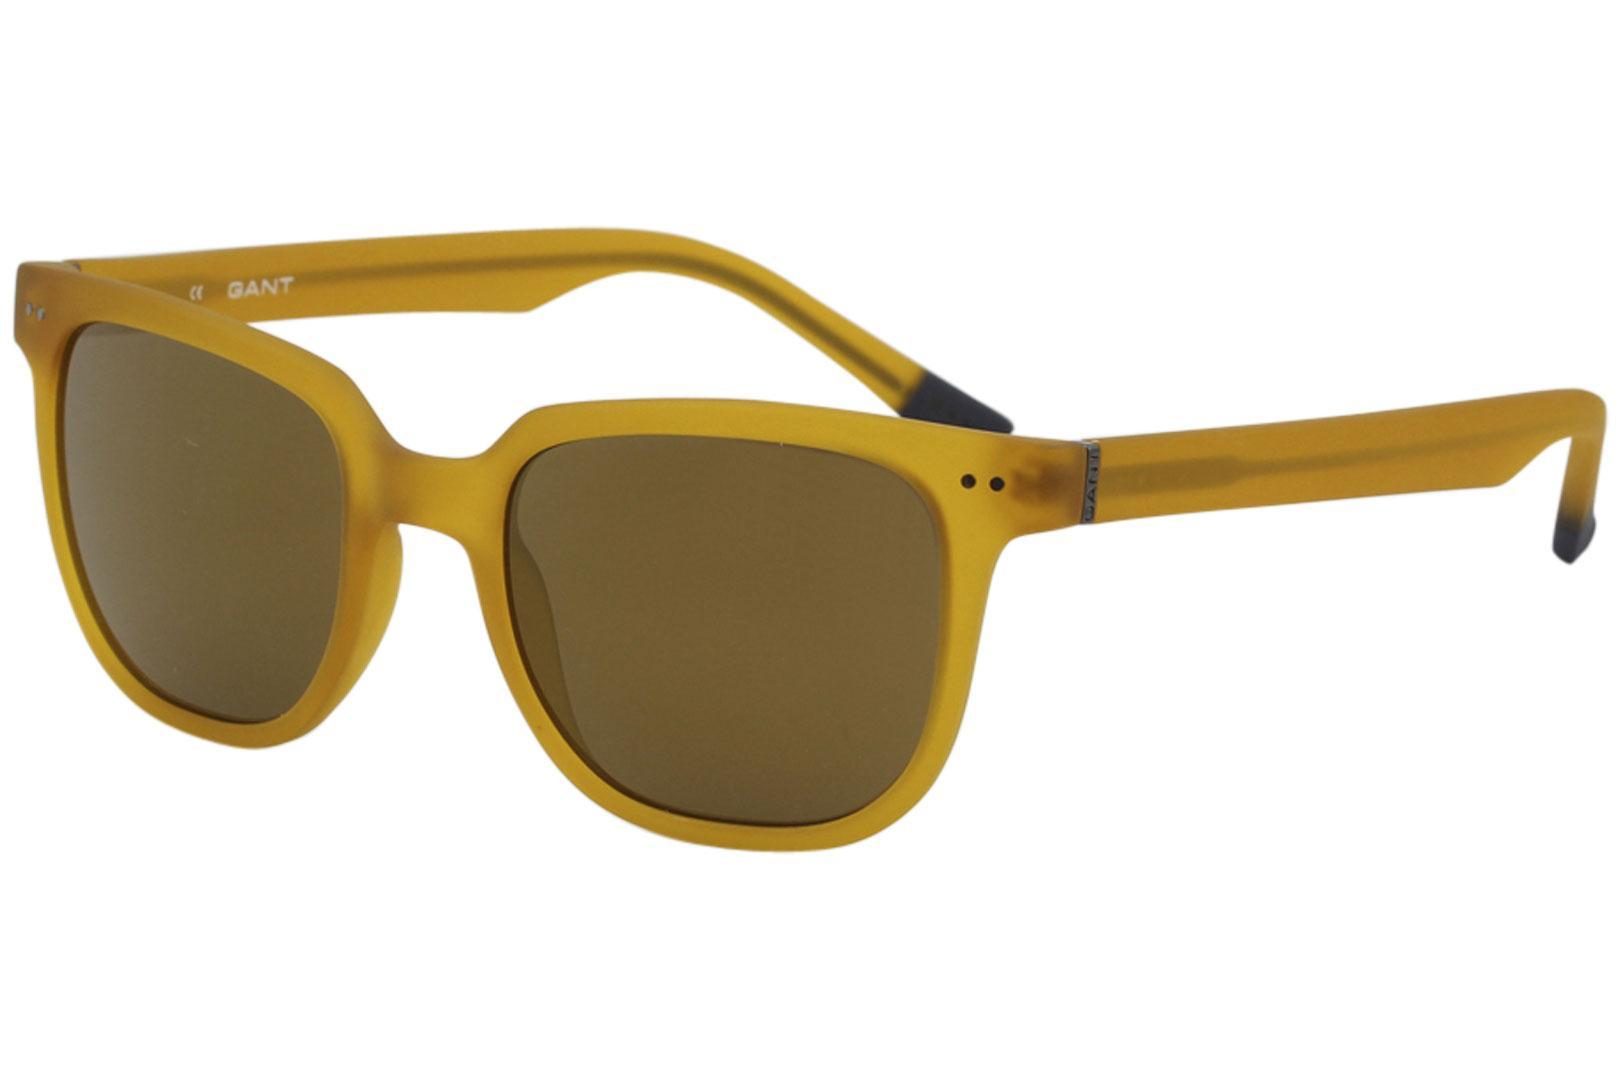 Image of Gant Men's GS7019 GS/7019 Fashion Square Sunglasses - Matte Honey/Brown Gold Mirror   MHNY/15F - Lens 52 Bridge 20 Temple 145mm